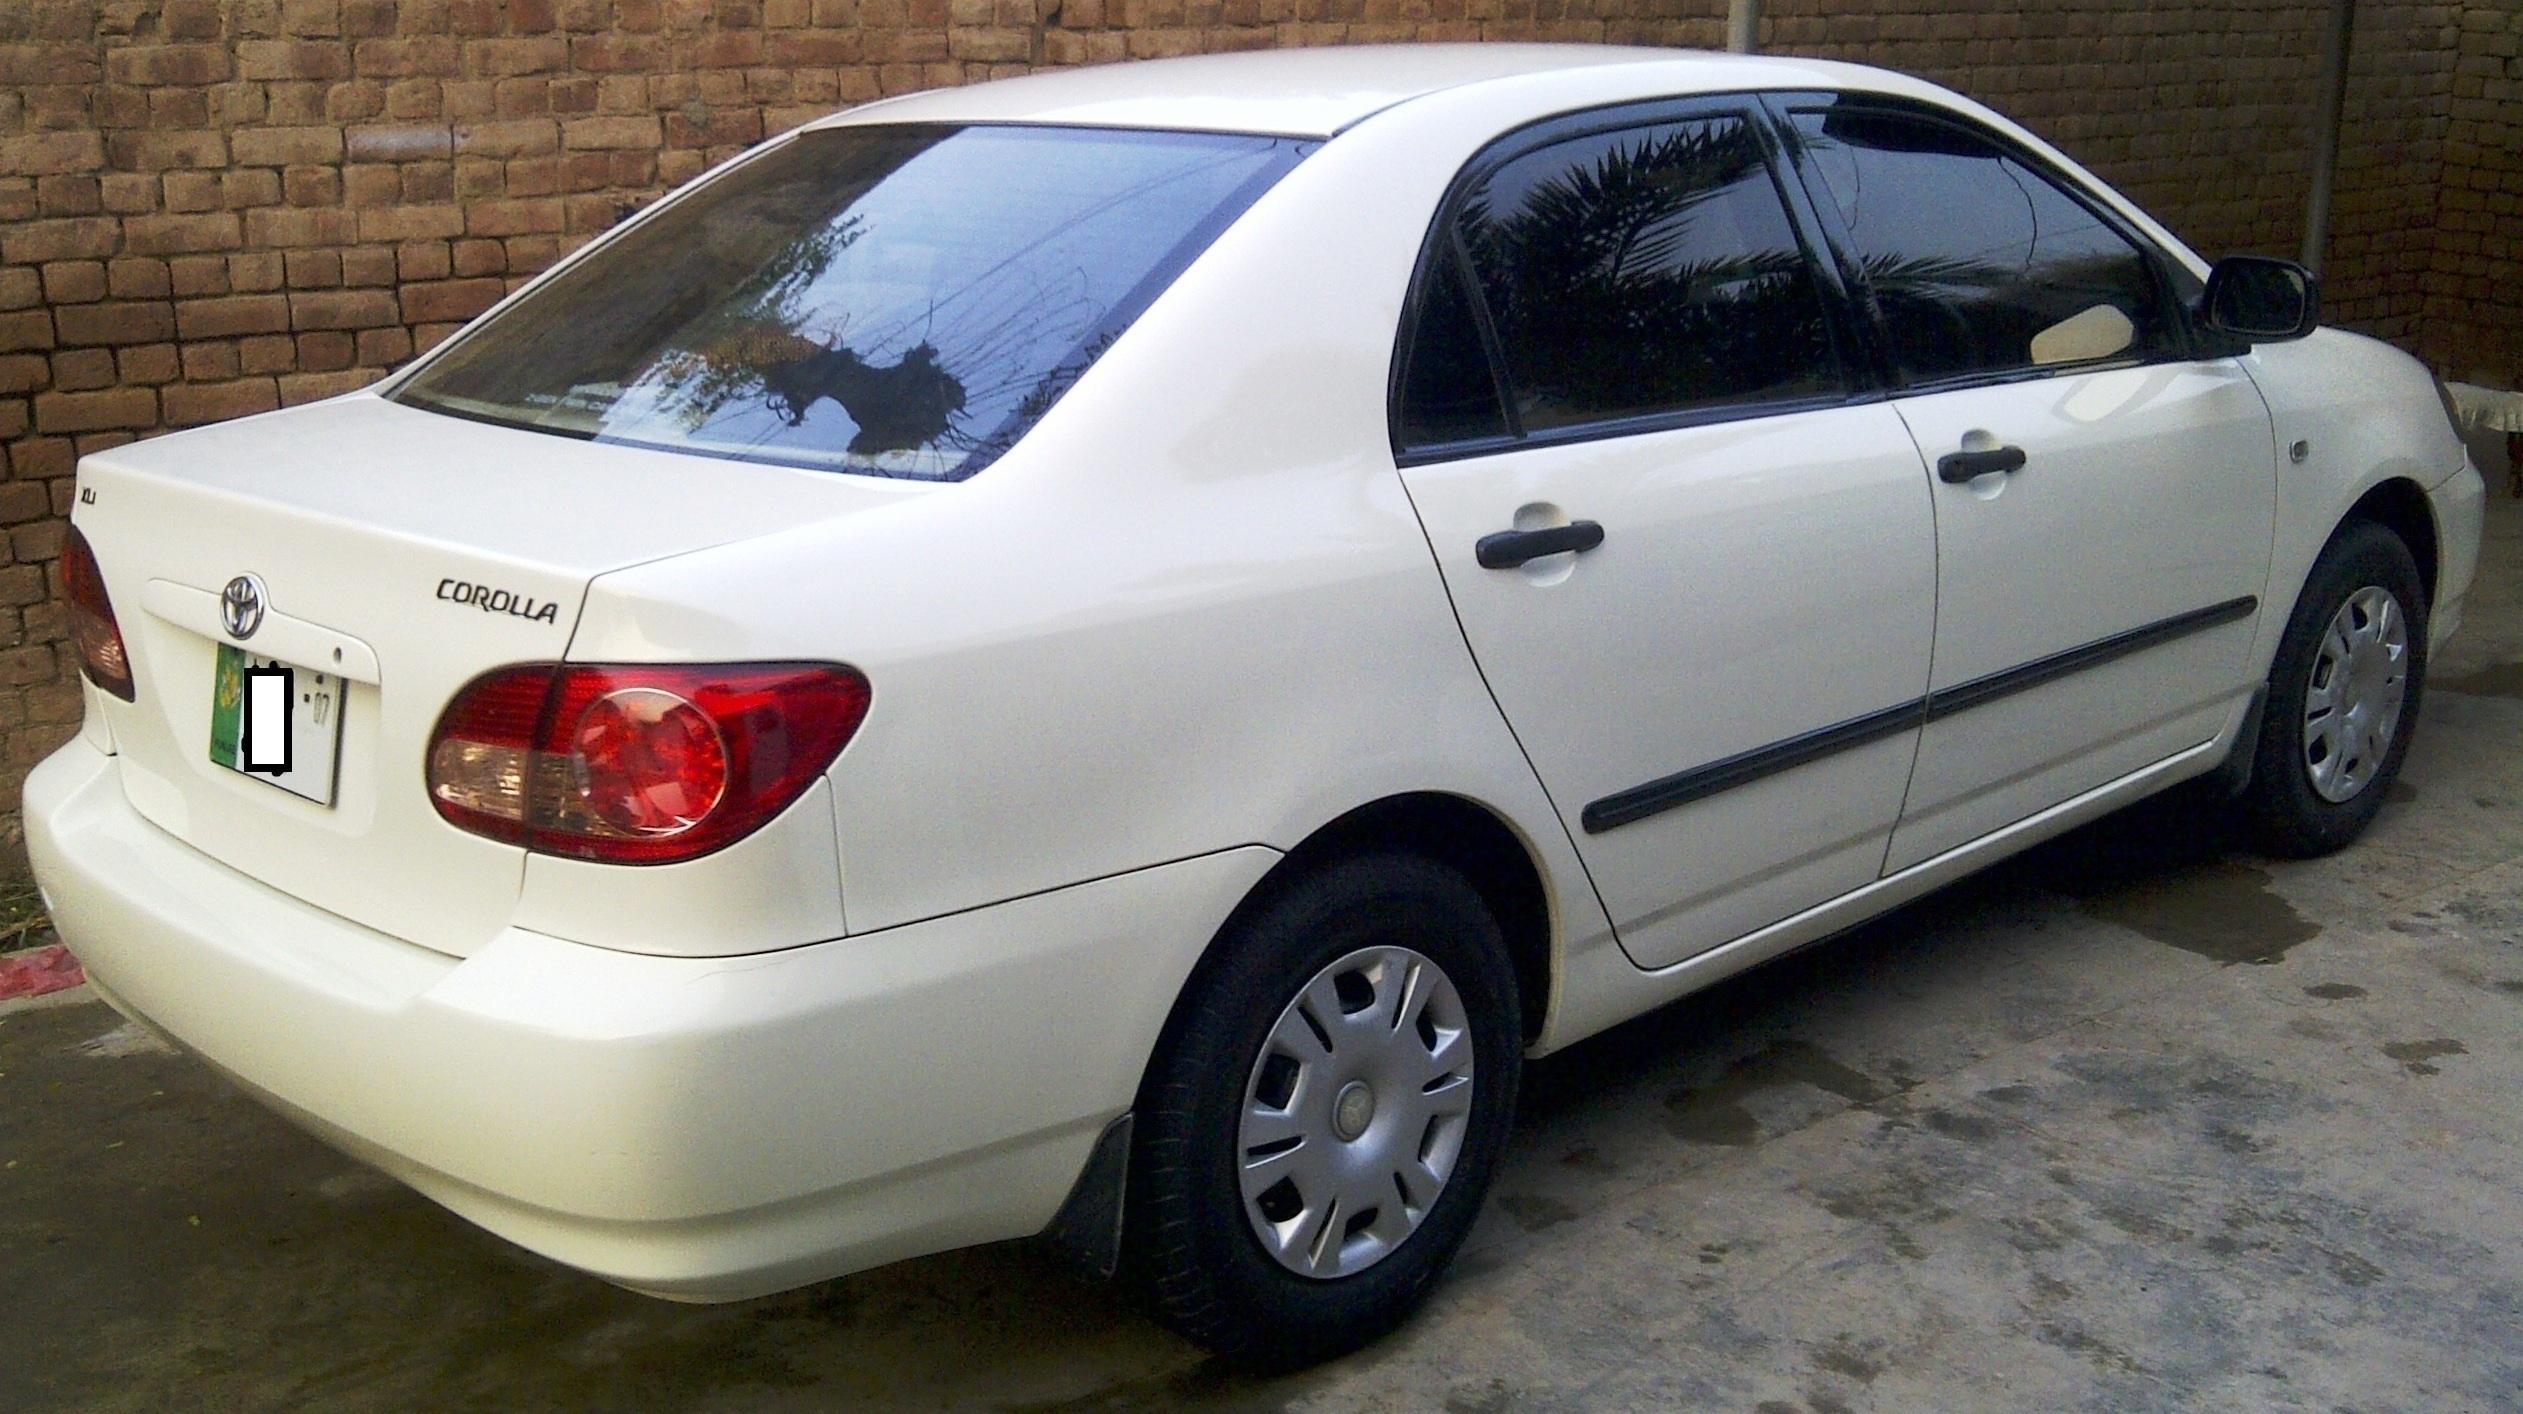 used toyota corolla xli 2006 car for sale in jhelum 332623 pakwheels. Black Bedroom Furniture Sets. Home Design Ideas